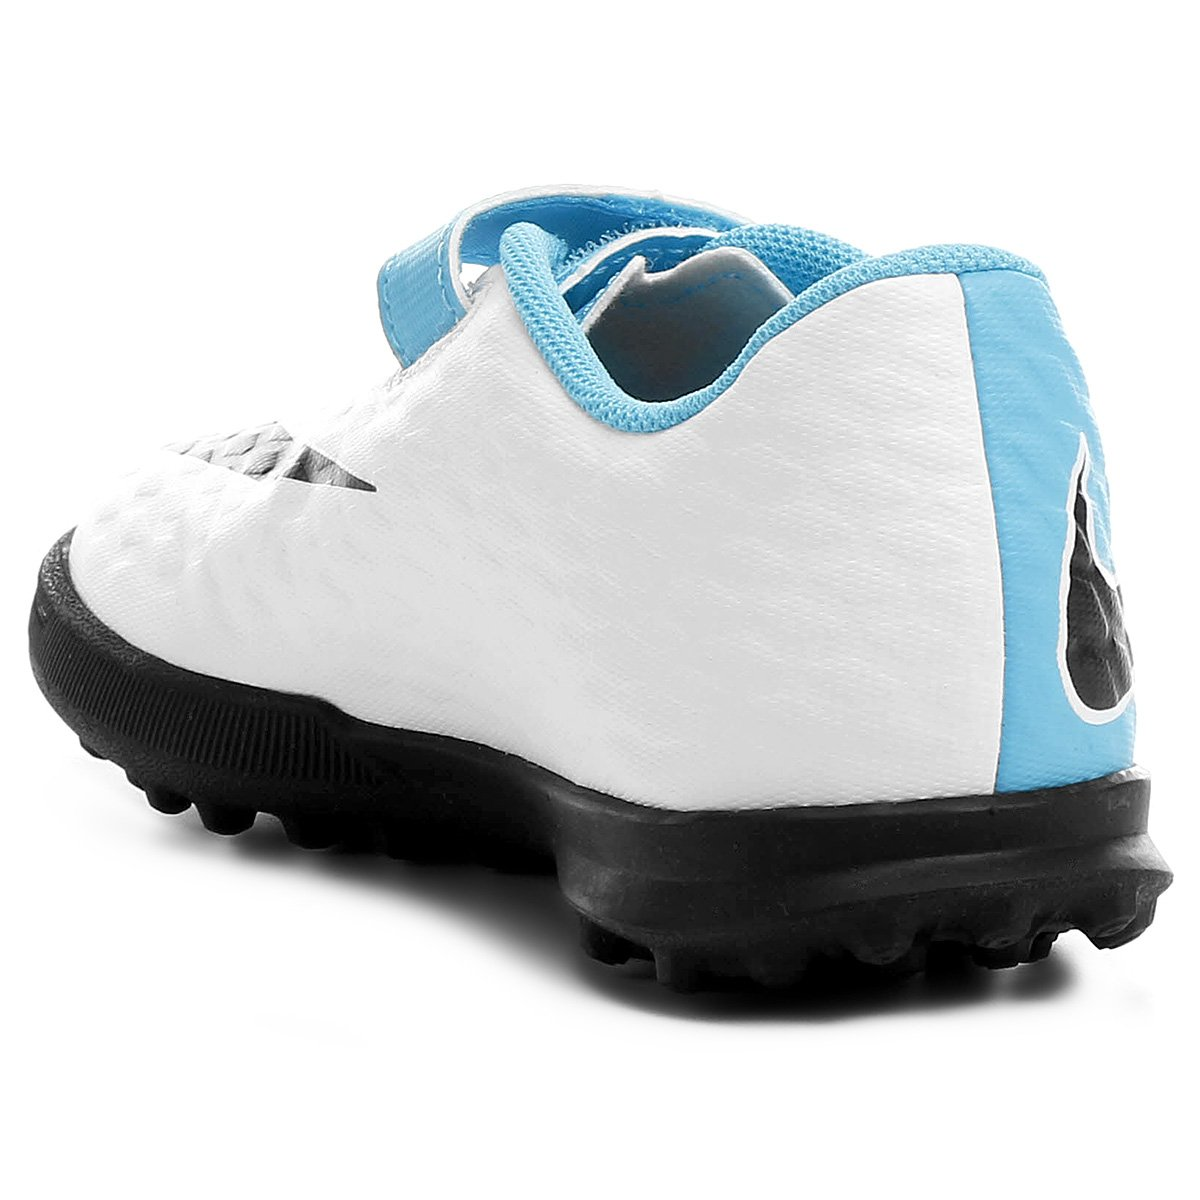 Chuteira Society Infantil Nike Hypervenom Phade 3 (V) TF - Compre ... 06c9cd9ce441d